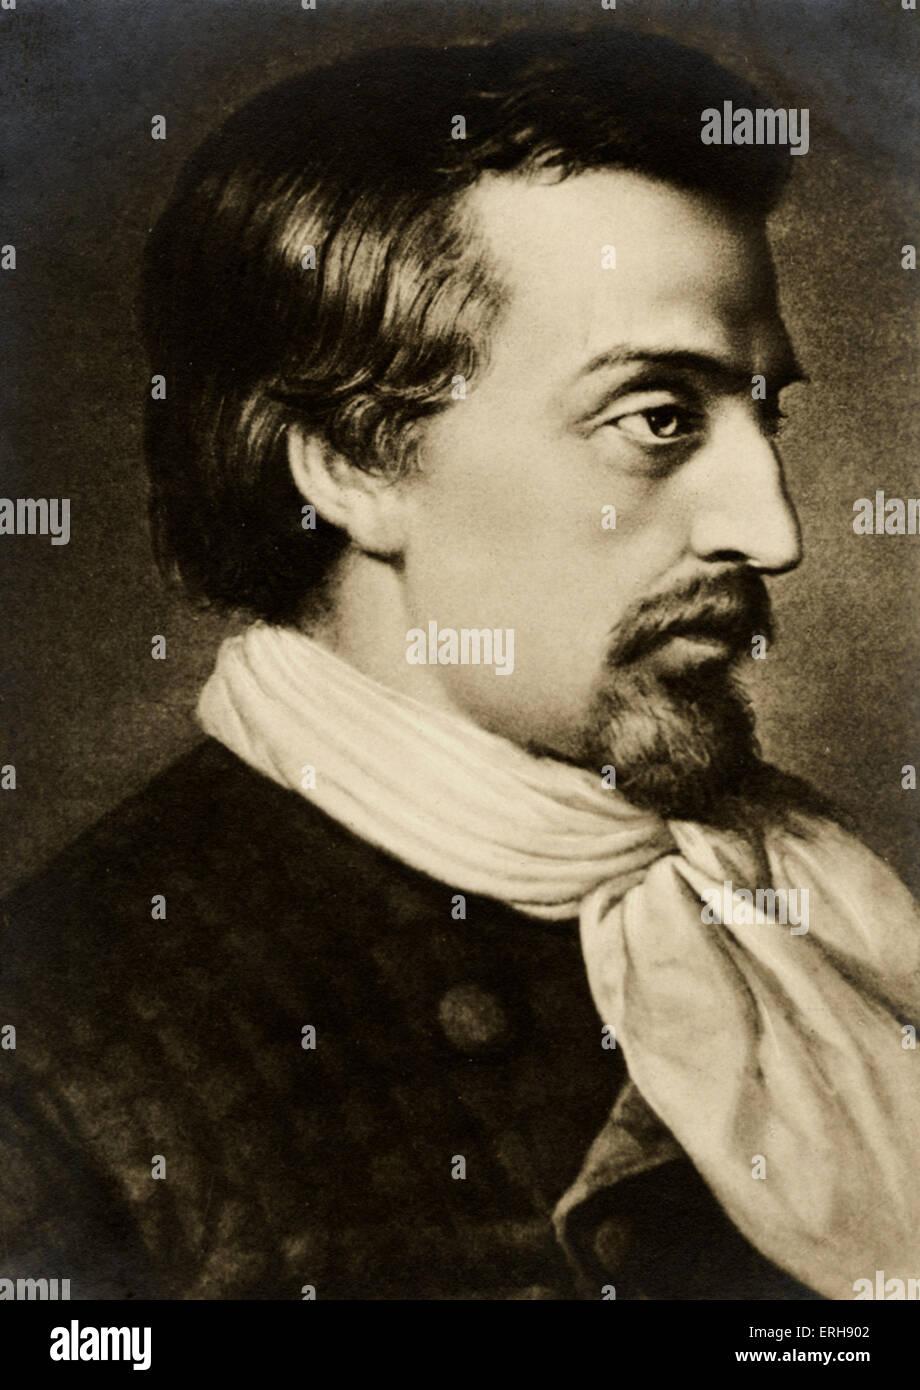 HEINE, Heinrich German poet, 1797-1856. - Stock Image